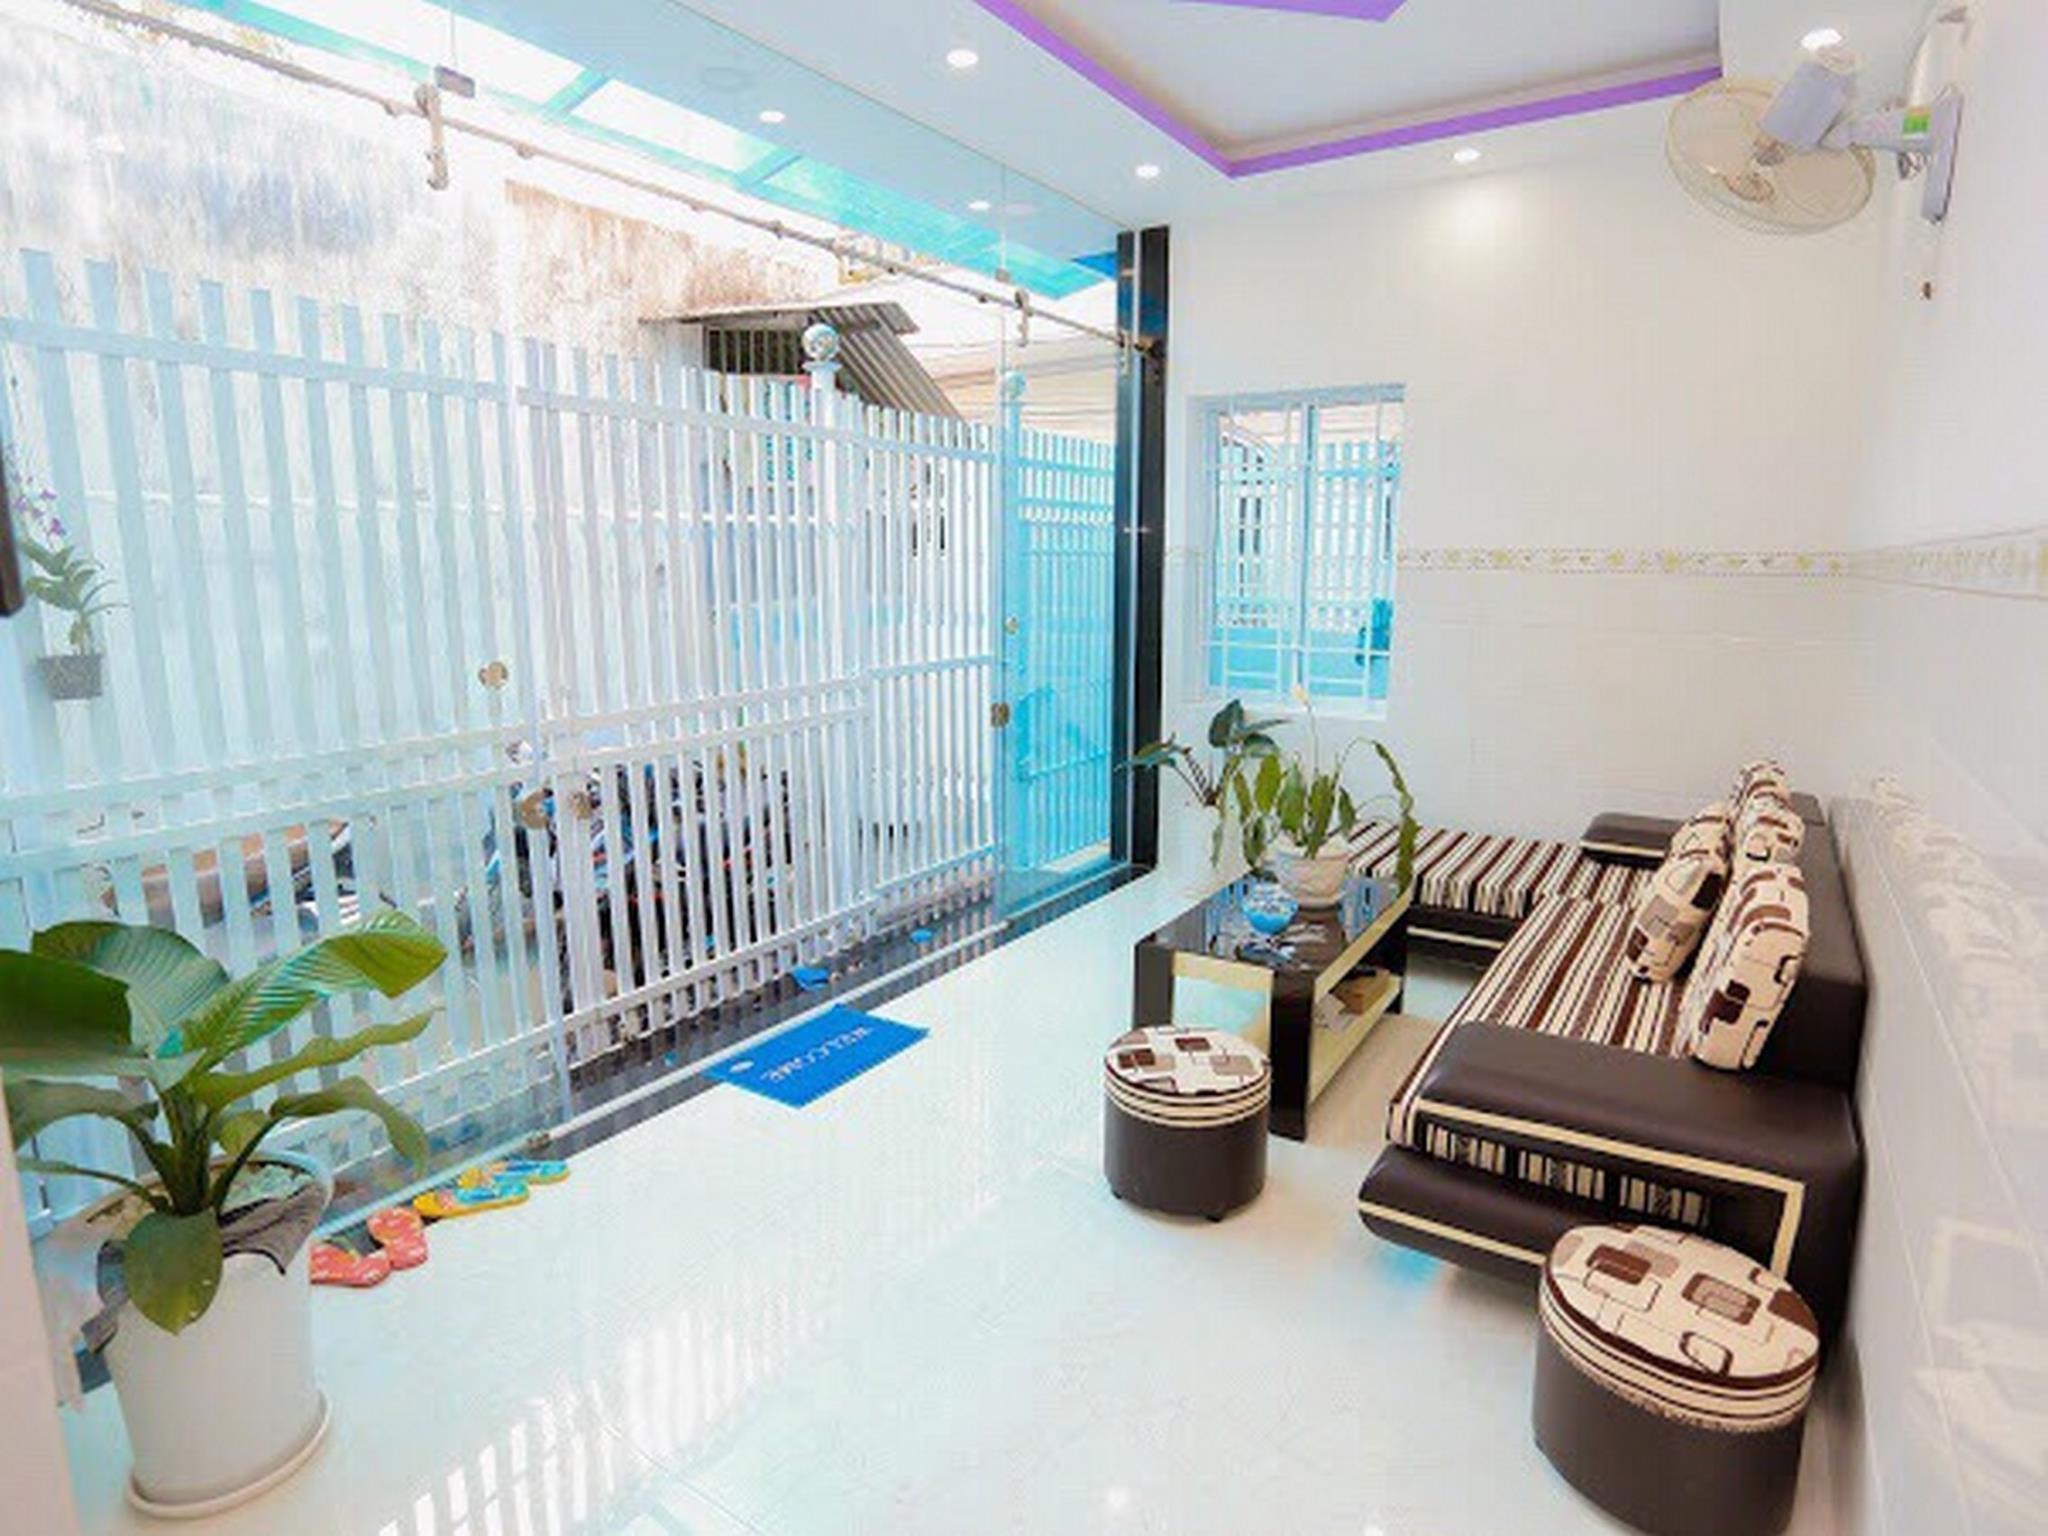 Thap Ba HaNa Apartment Nha Trang Vietnam